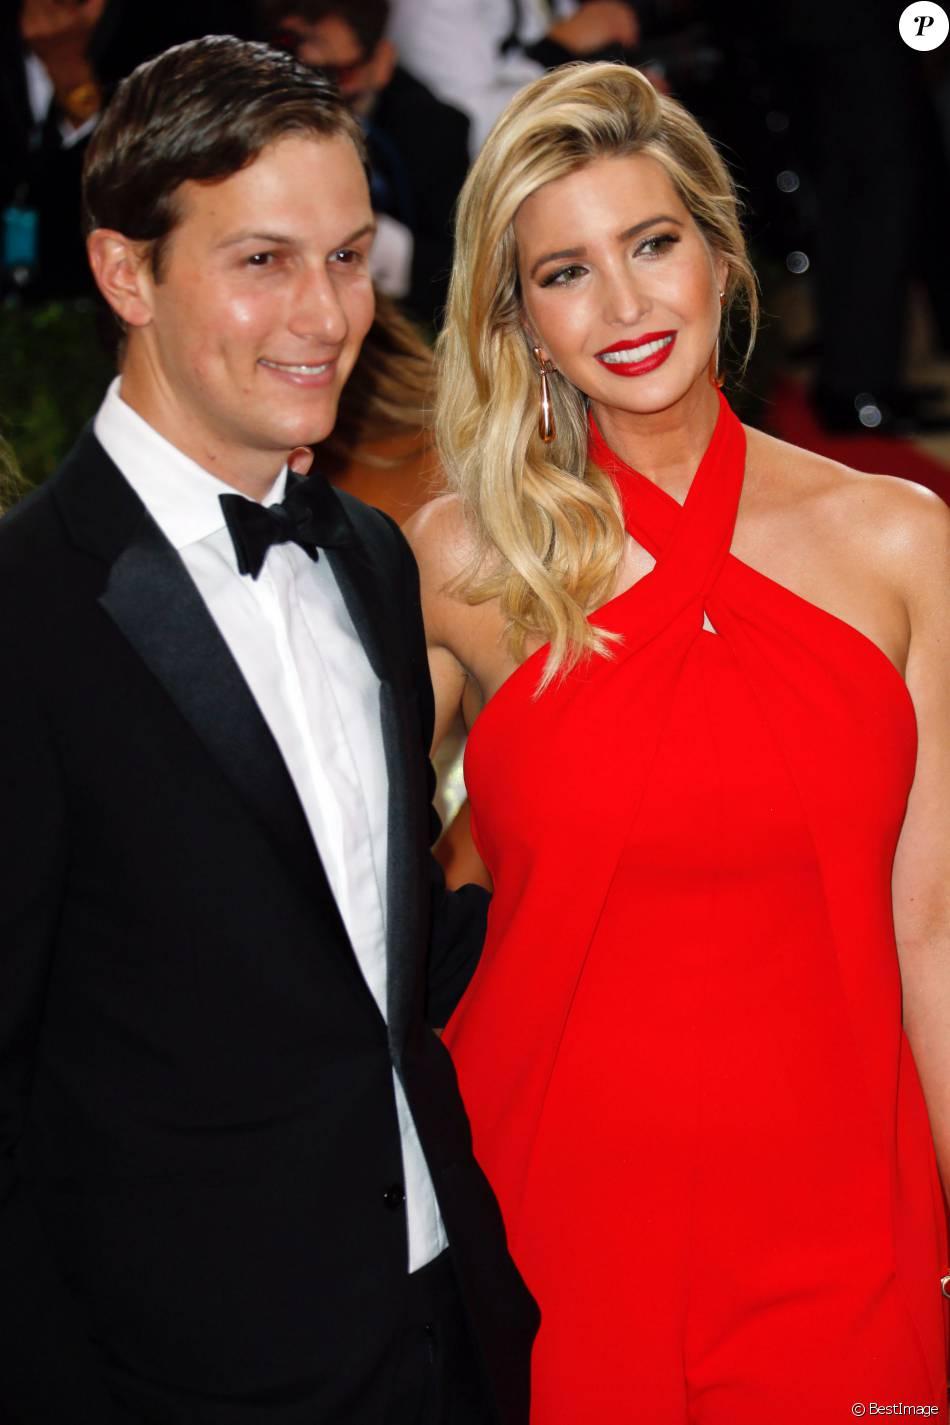 Jared Kushner et sa femme Ivanka Trump , Met Gala 2016, vernissage de lexposition Manus x Machina au Metropolitan Museum of Art. New York, le 2 mai 2016.